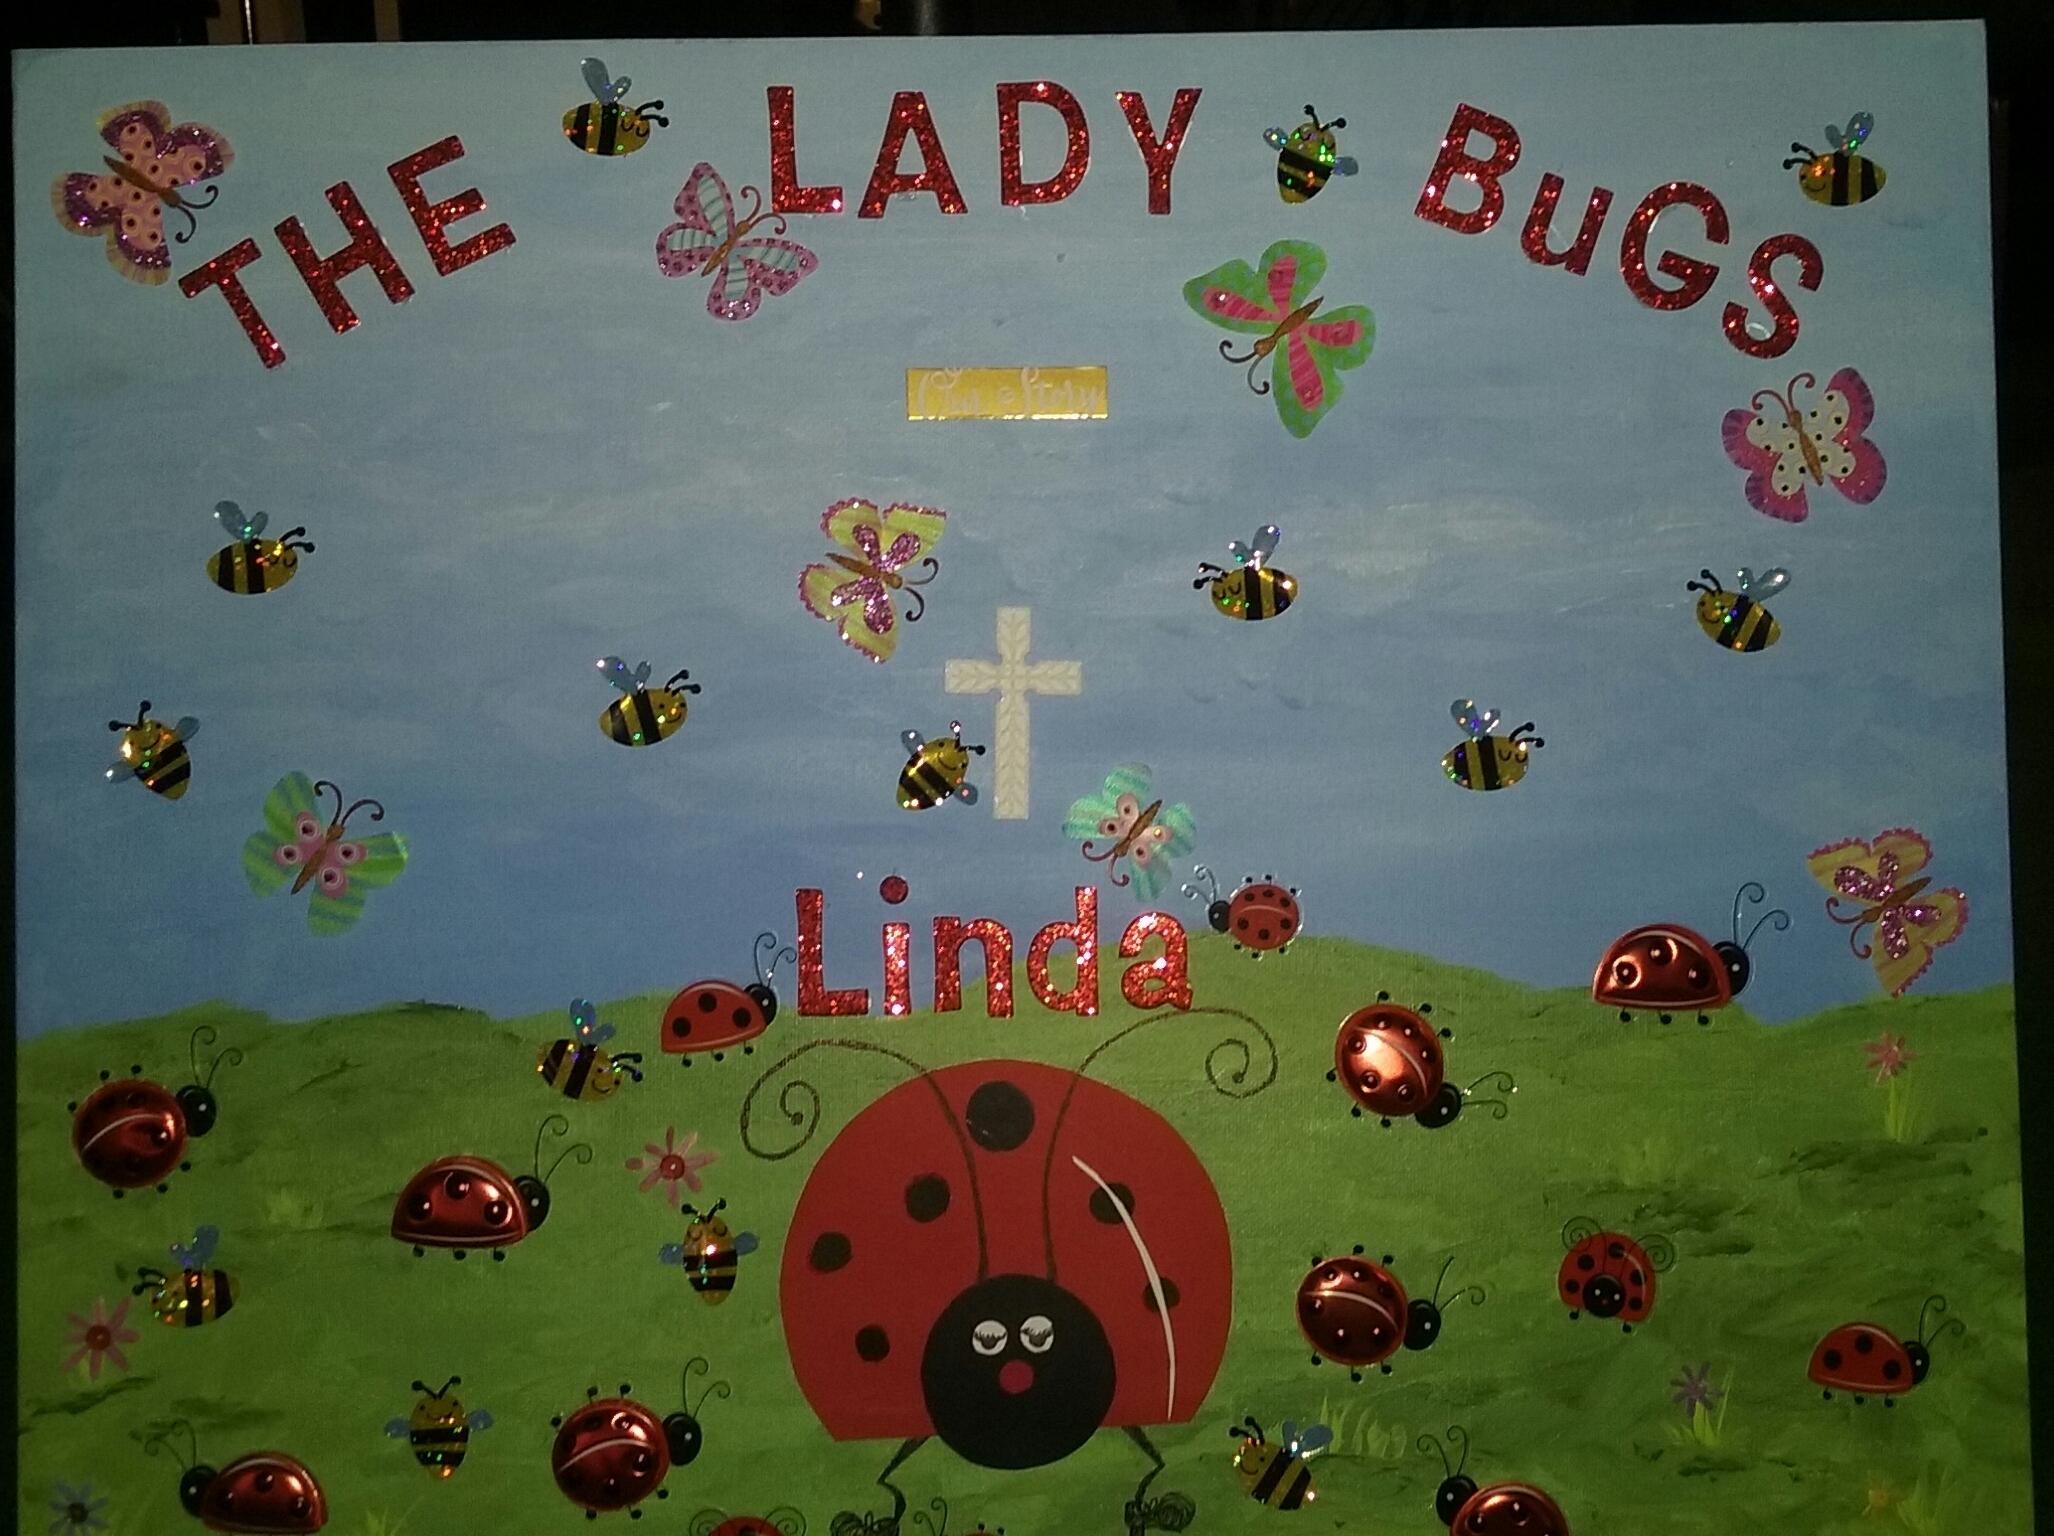 LadyBugs Class